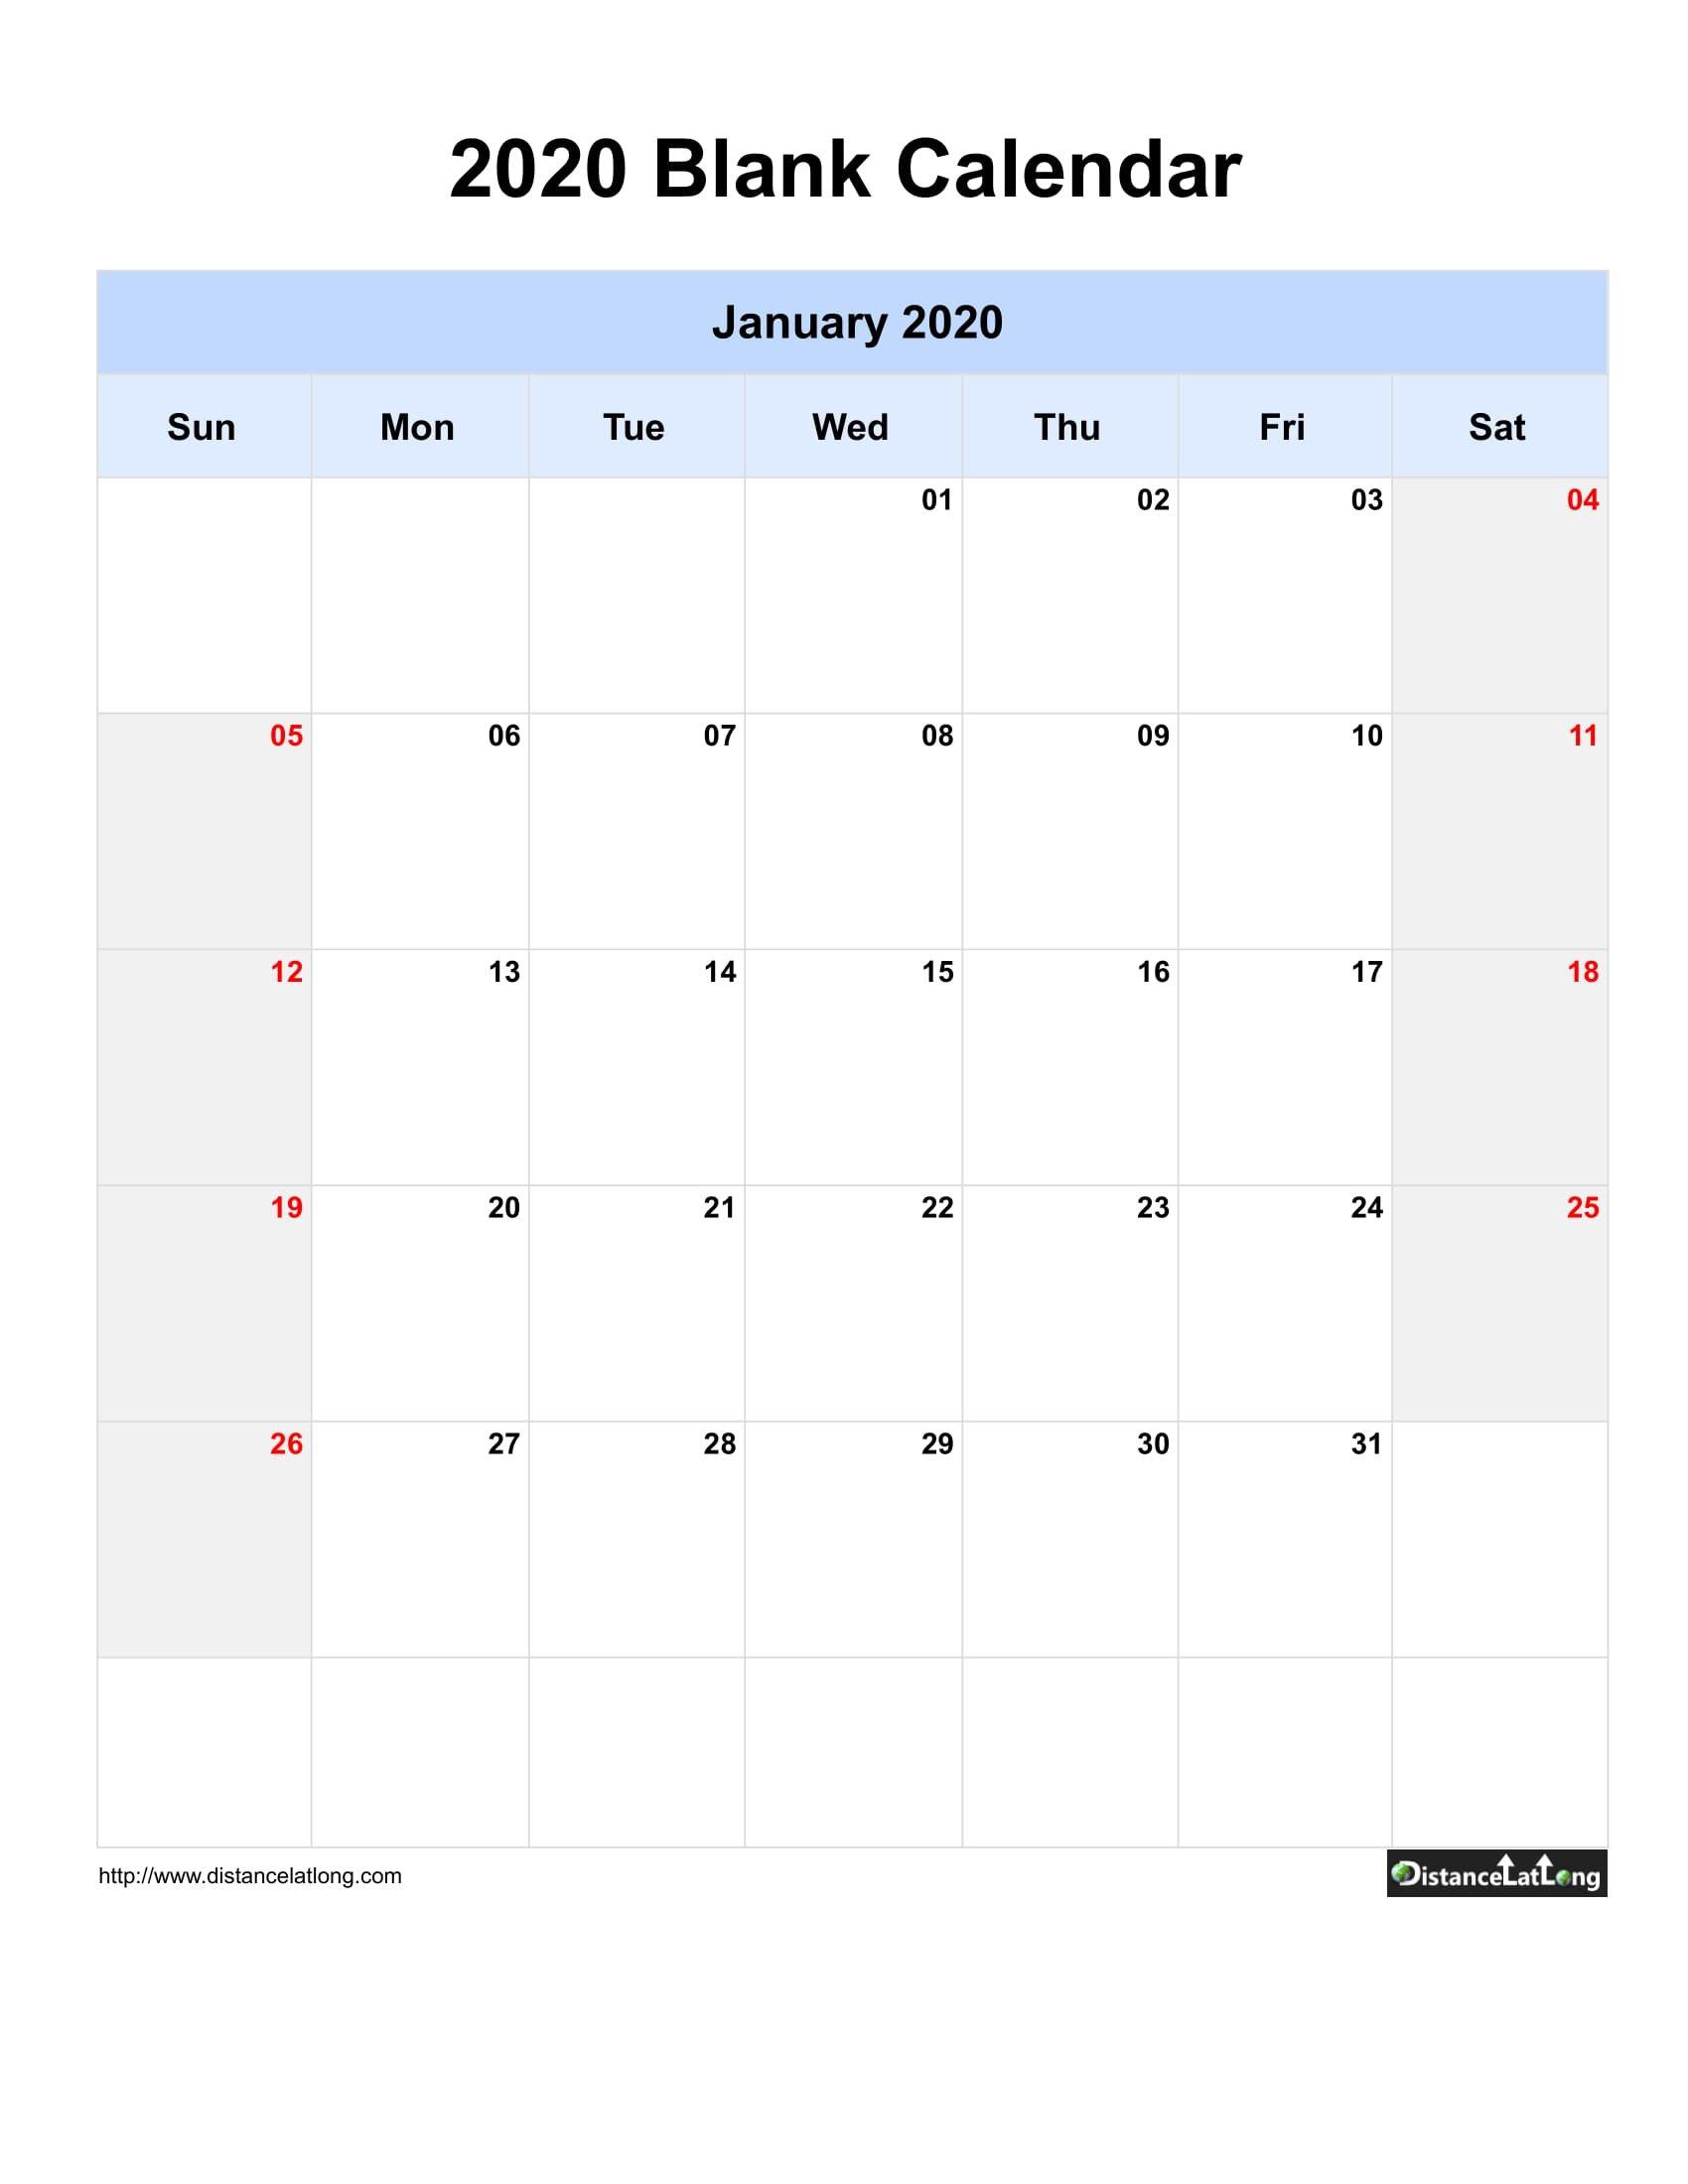 2020 Blank Calendar Blank Portrait Orientation Free One Week Printable Calnedar